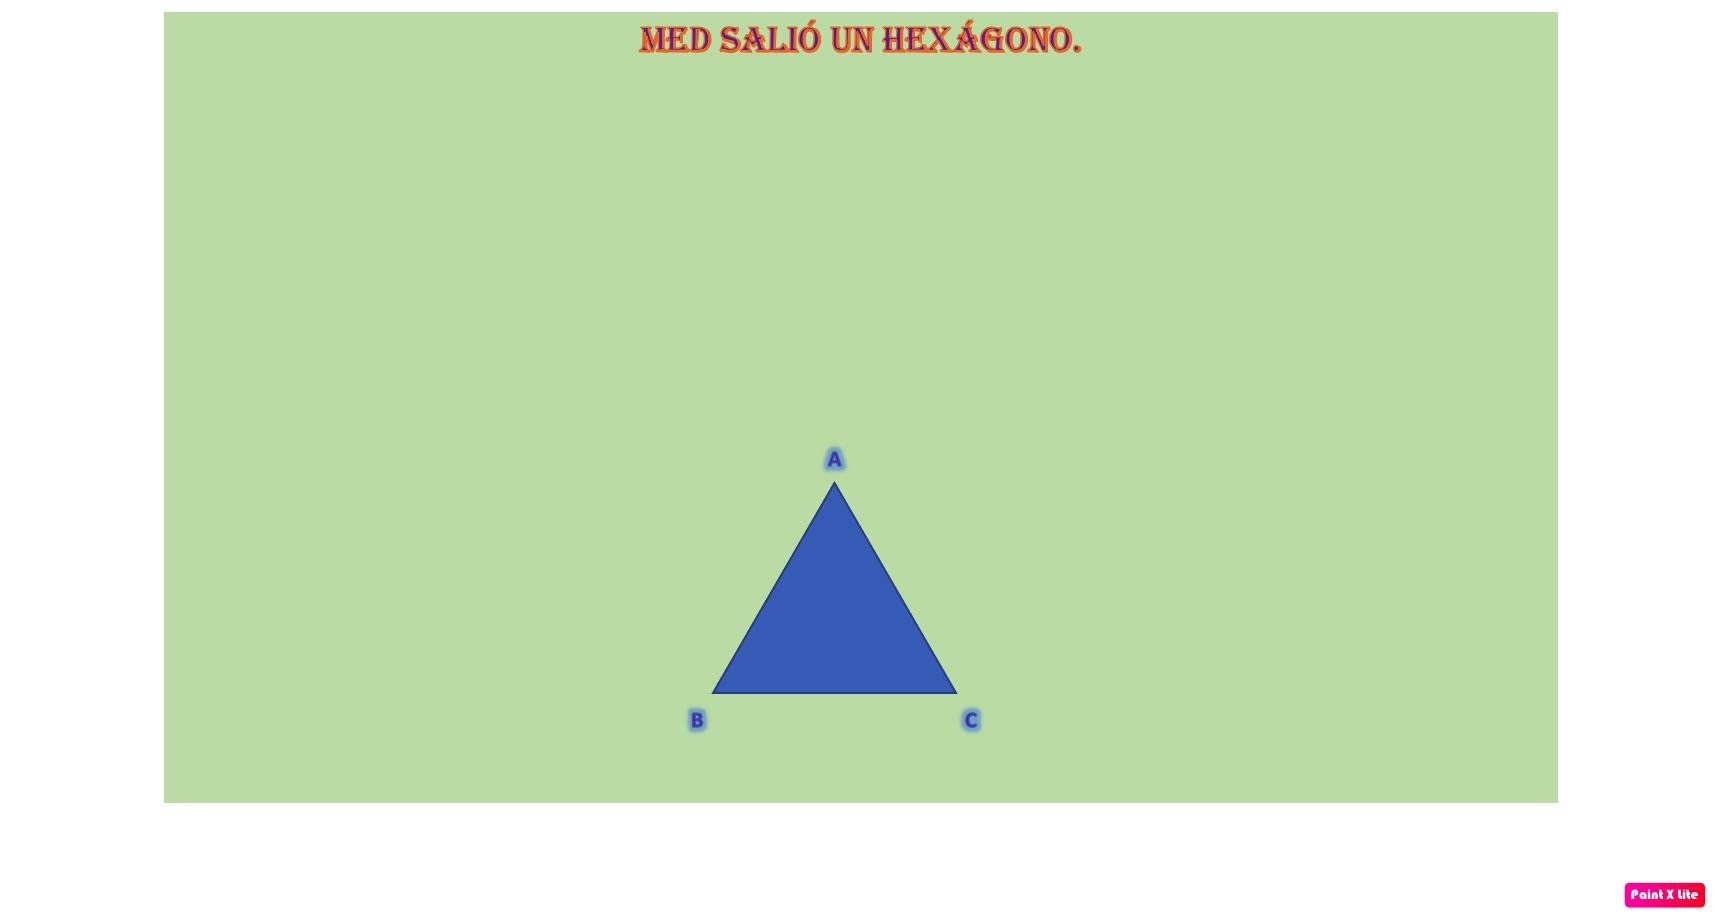 Salio%CC%81+un+hexa%CC%81gono.jpg